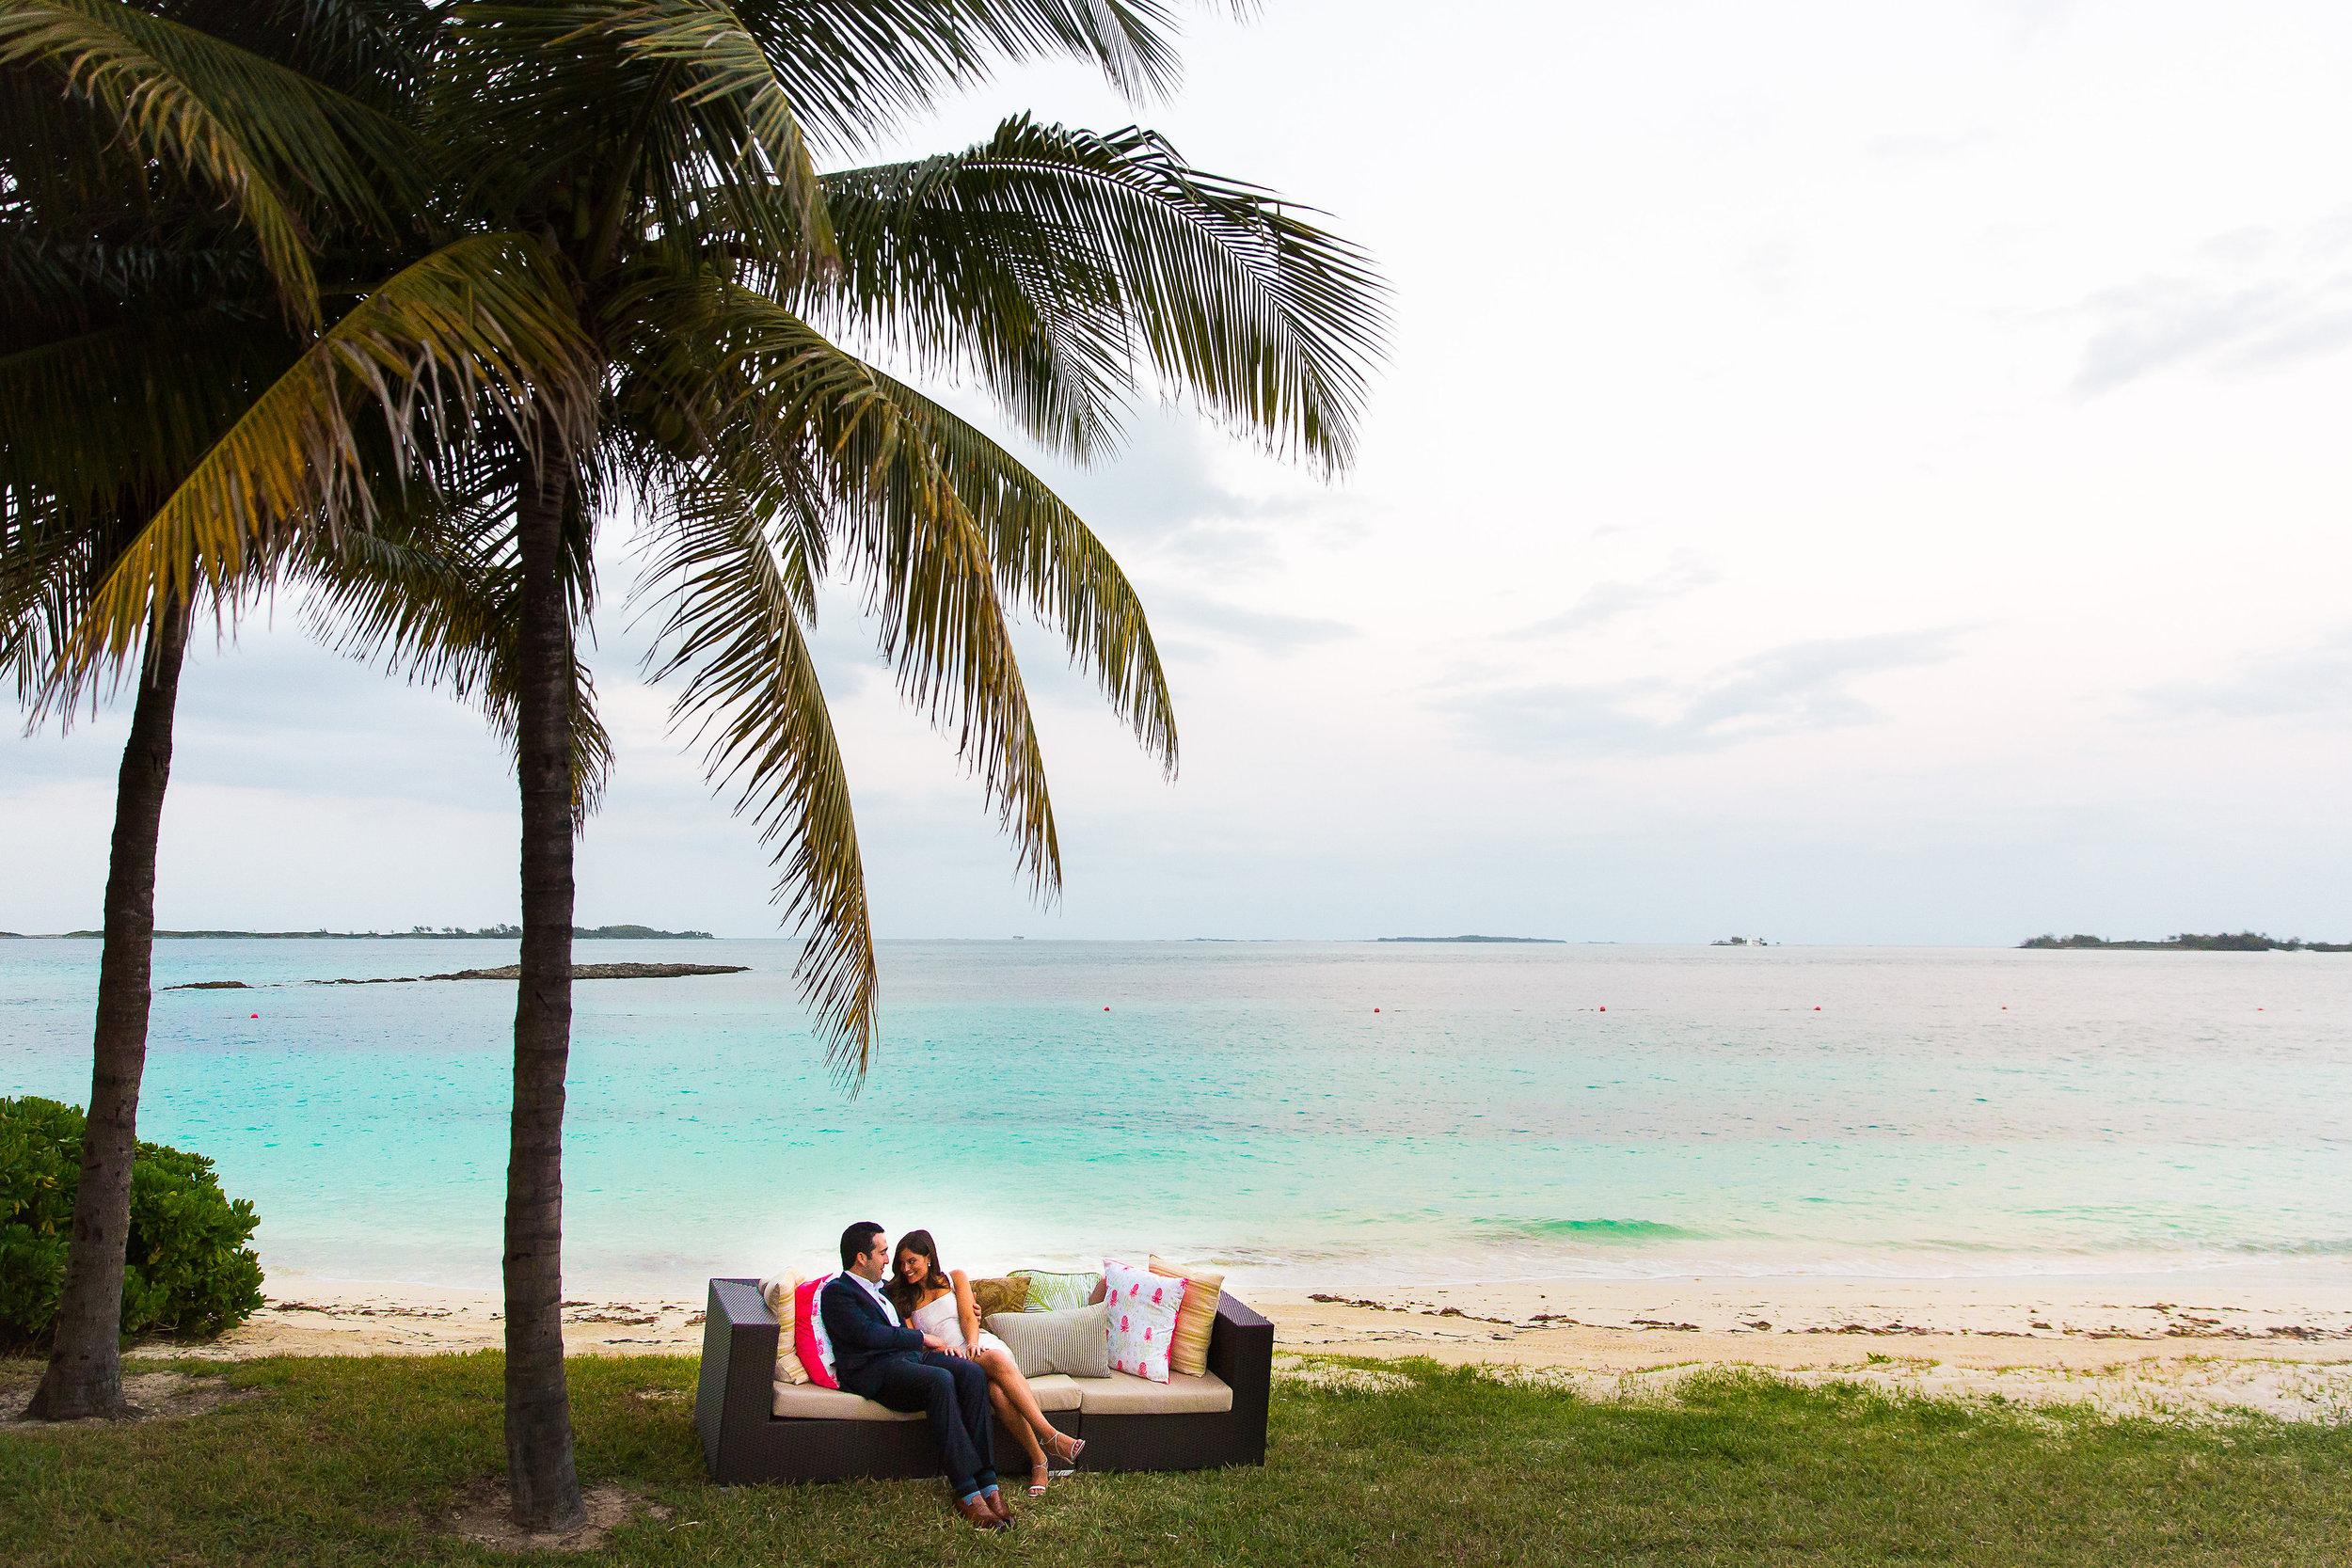 Ceci_New_York_Ceci_Style_Ceci_Johnson_Luxury_Lifestyle_Destination_Bahamas_Wedding_Letterpress_Inspiration_Design_Custom_Couture_Personalized_Invitations_15.jpg